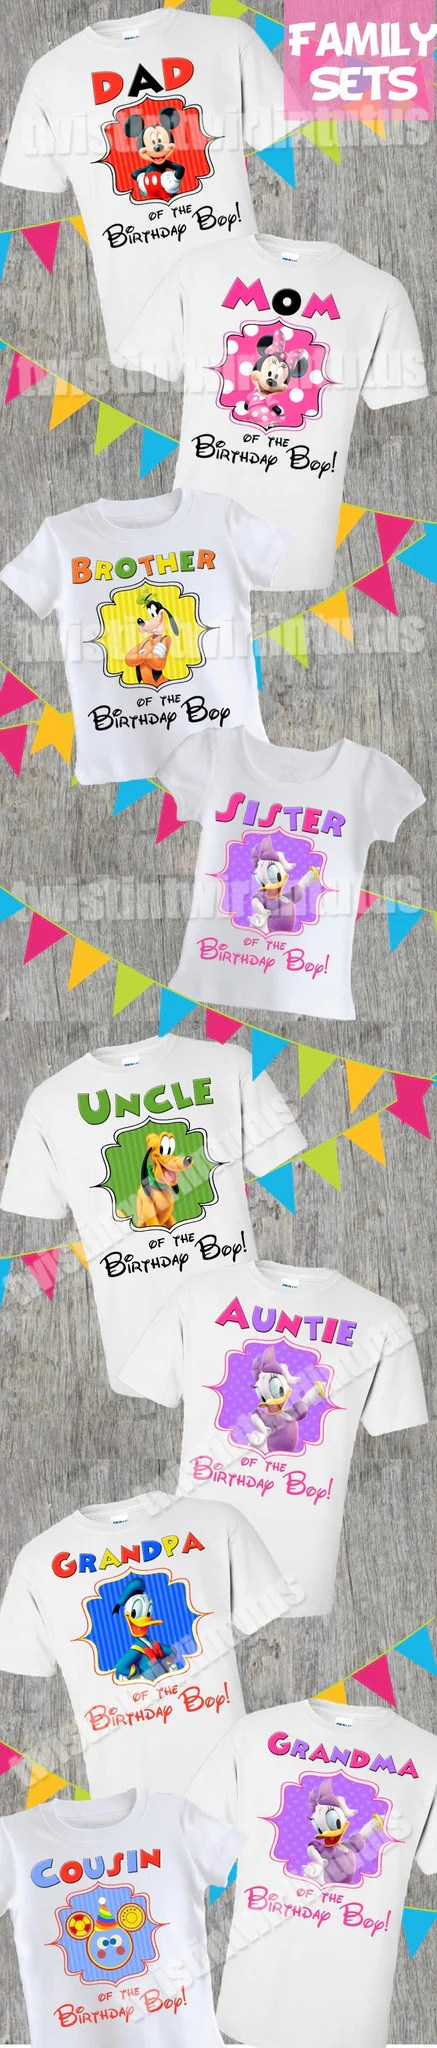 Mickey Mouse Clubhouse Family Birthday Shirts Twistin Twirlin Tutus